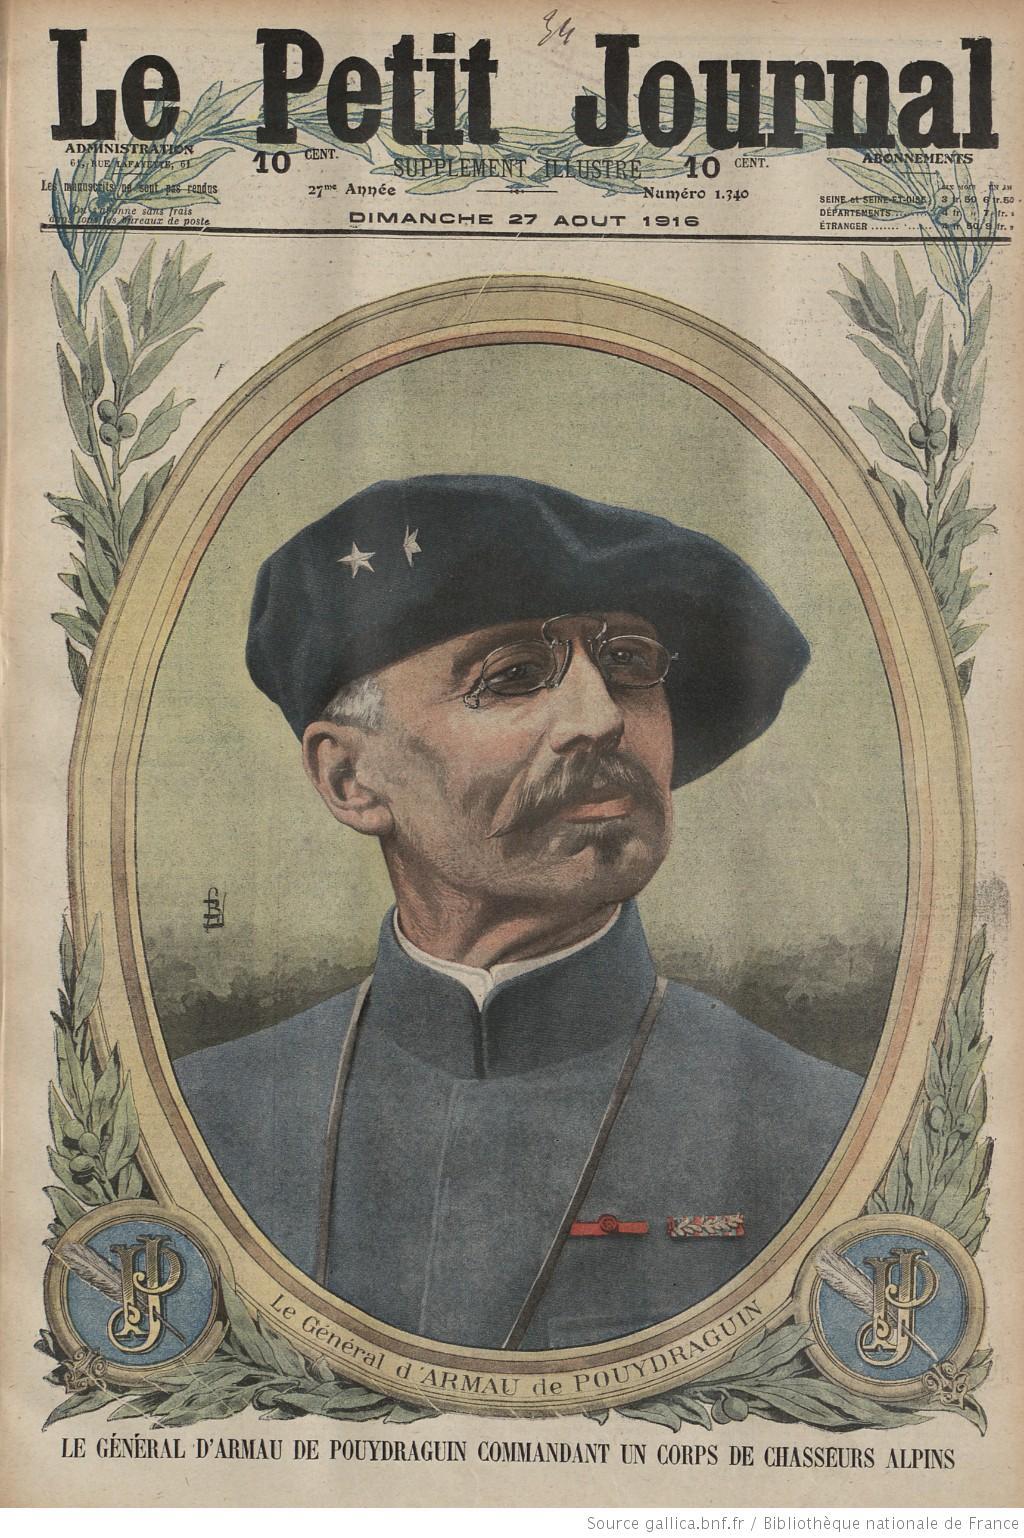 LPJ Illustre 1916-08-27 A.jpg